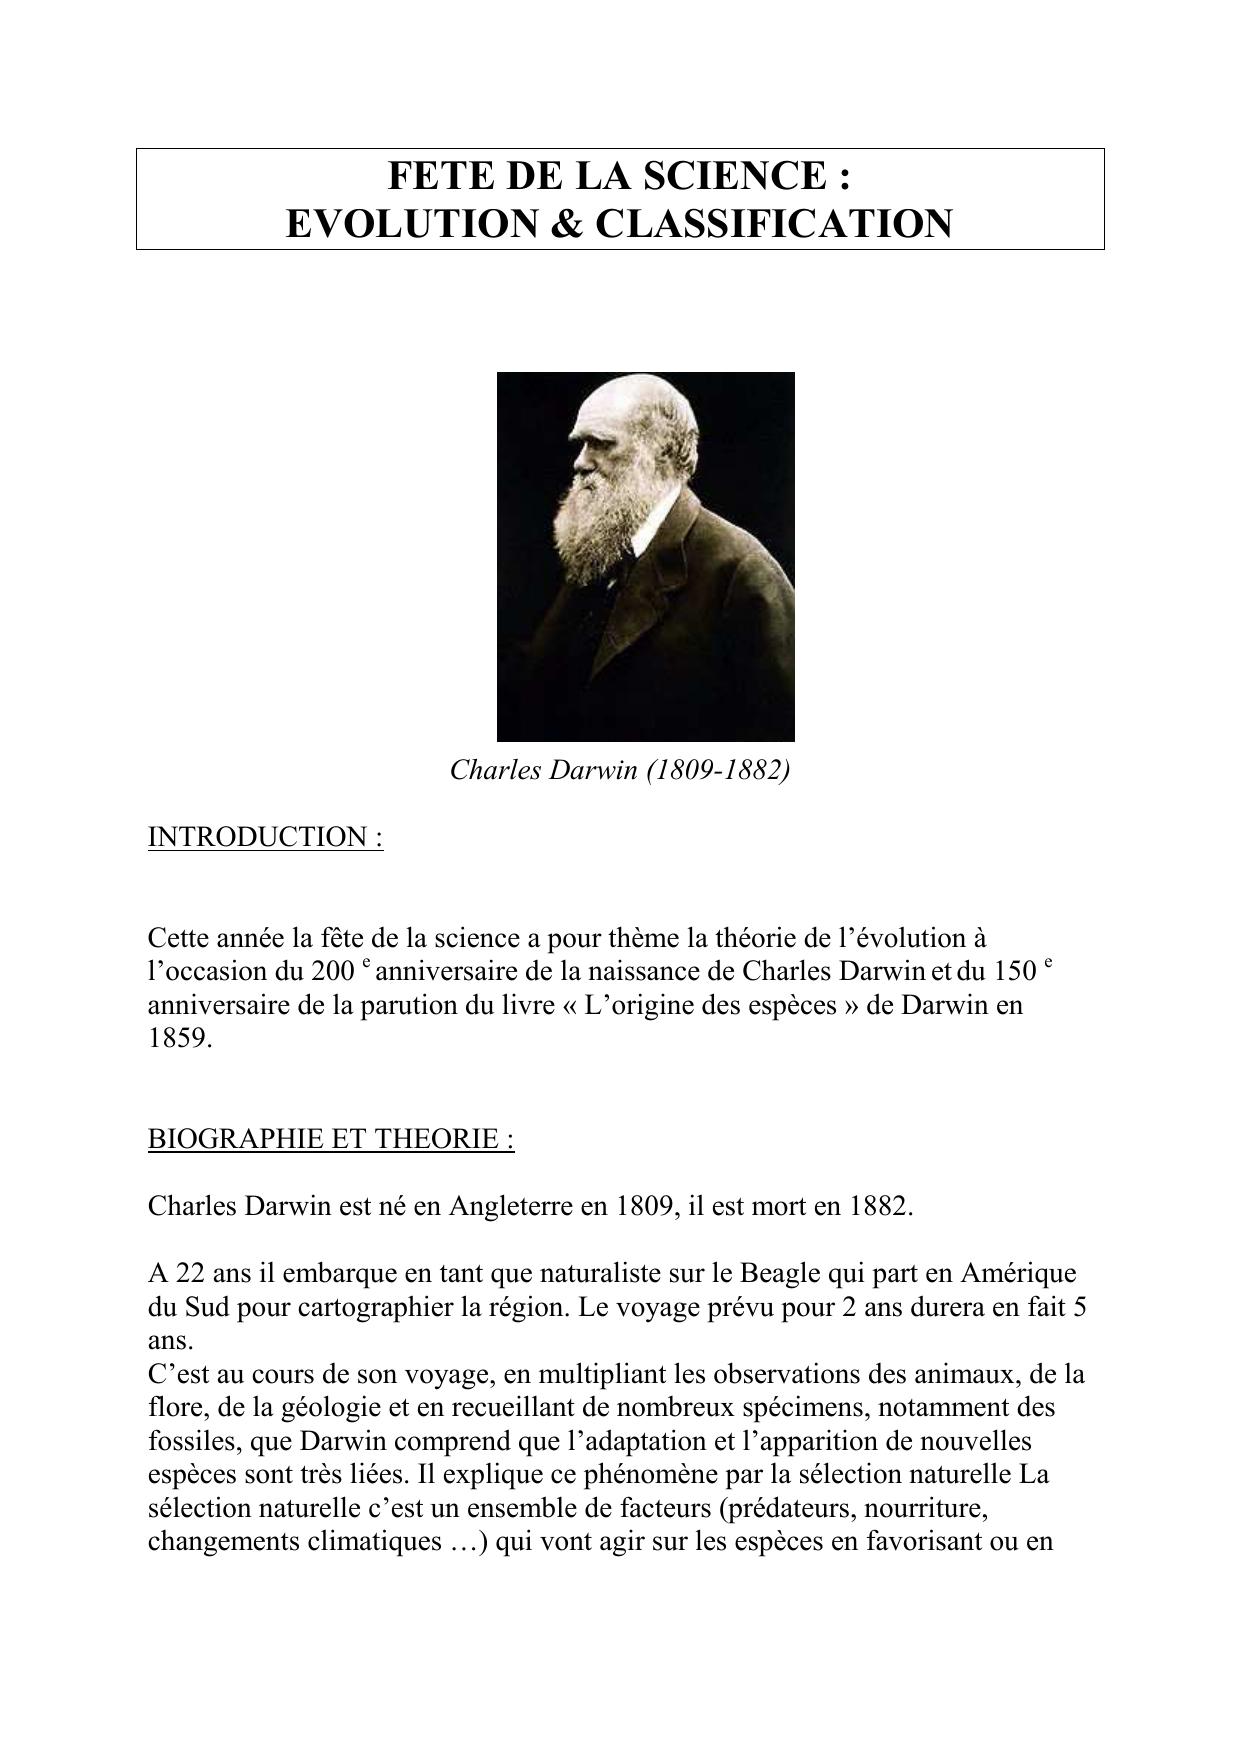 Vitesse de datation Darwin